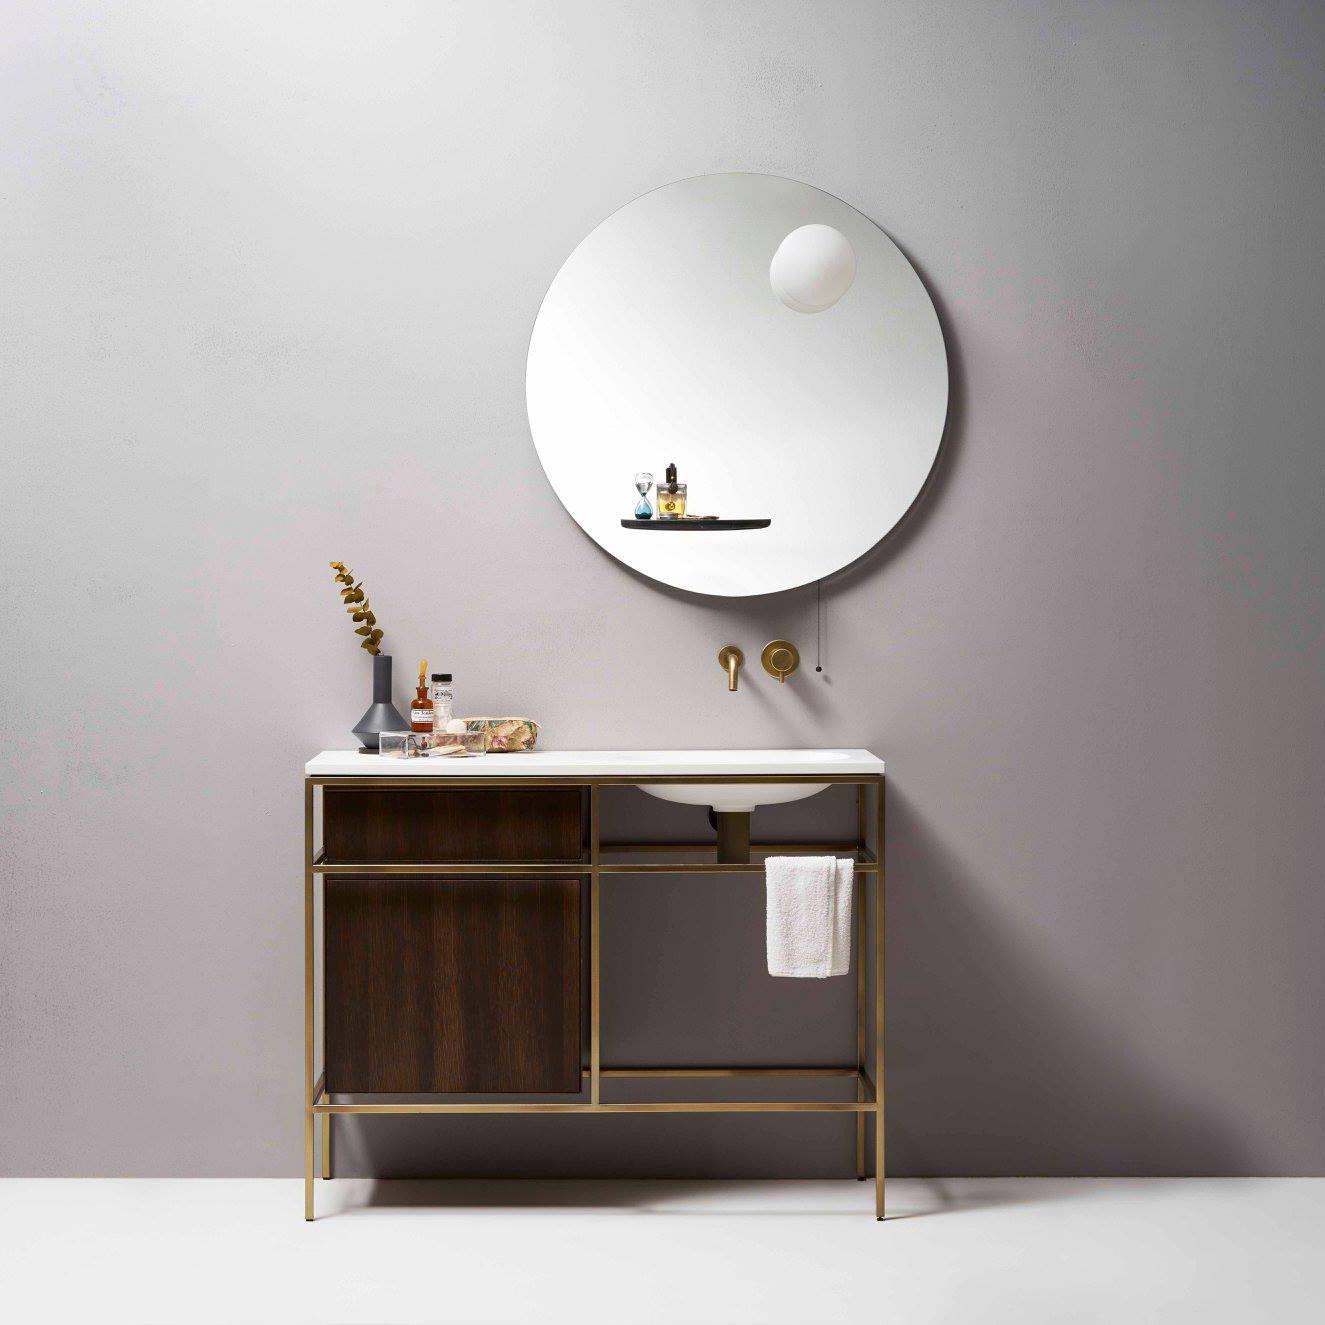 Pittura per bagno senza piastrelle cool tropicale stanza da bagno by hansgrohe france with - Pittura per bagno senza piastrelle ...